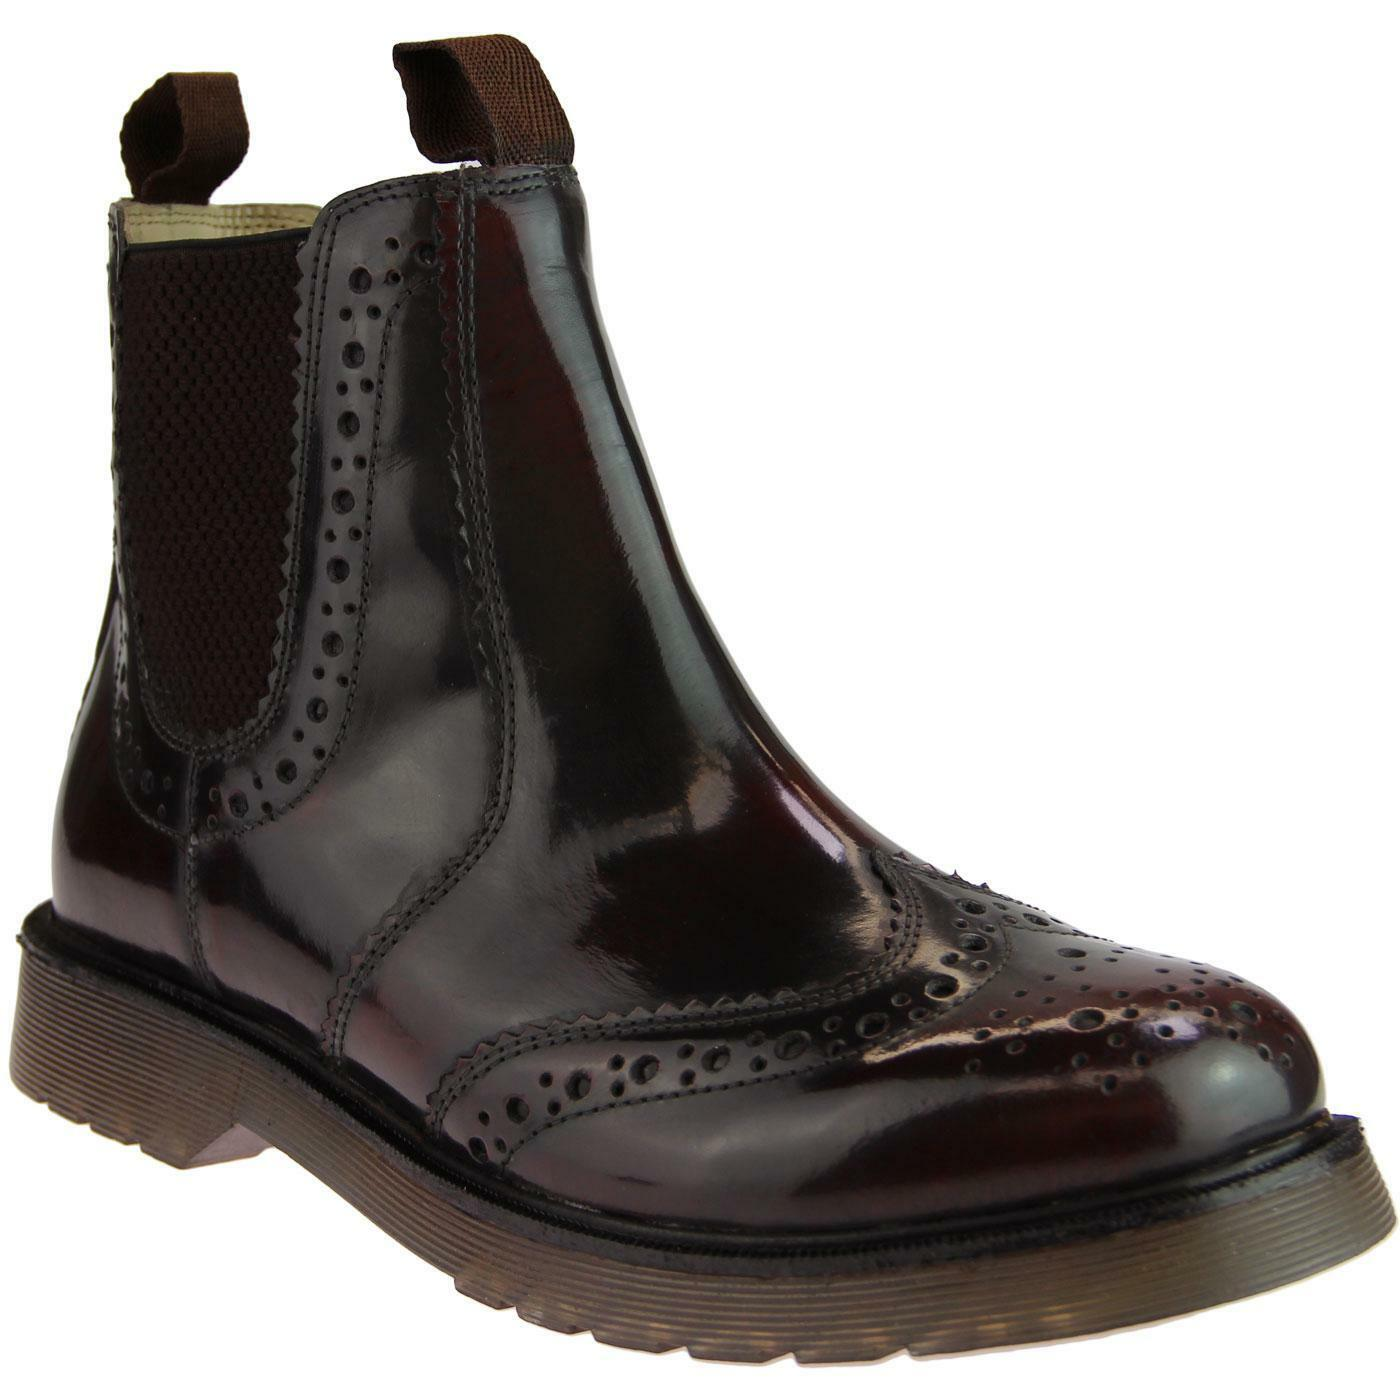 NEW MOD RETRO 60s MENS BROGUE CHELSEA Stiefel High Shine LEATHER Oxblood M757BD   | Elegantes und robustes Menü